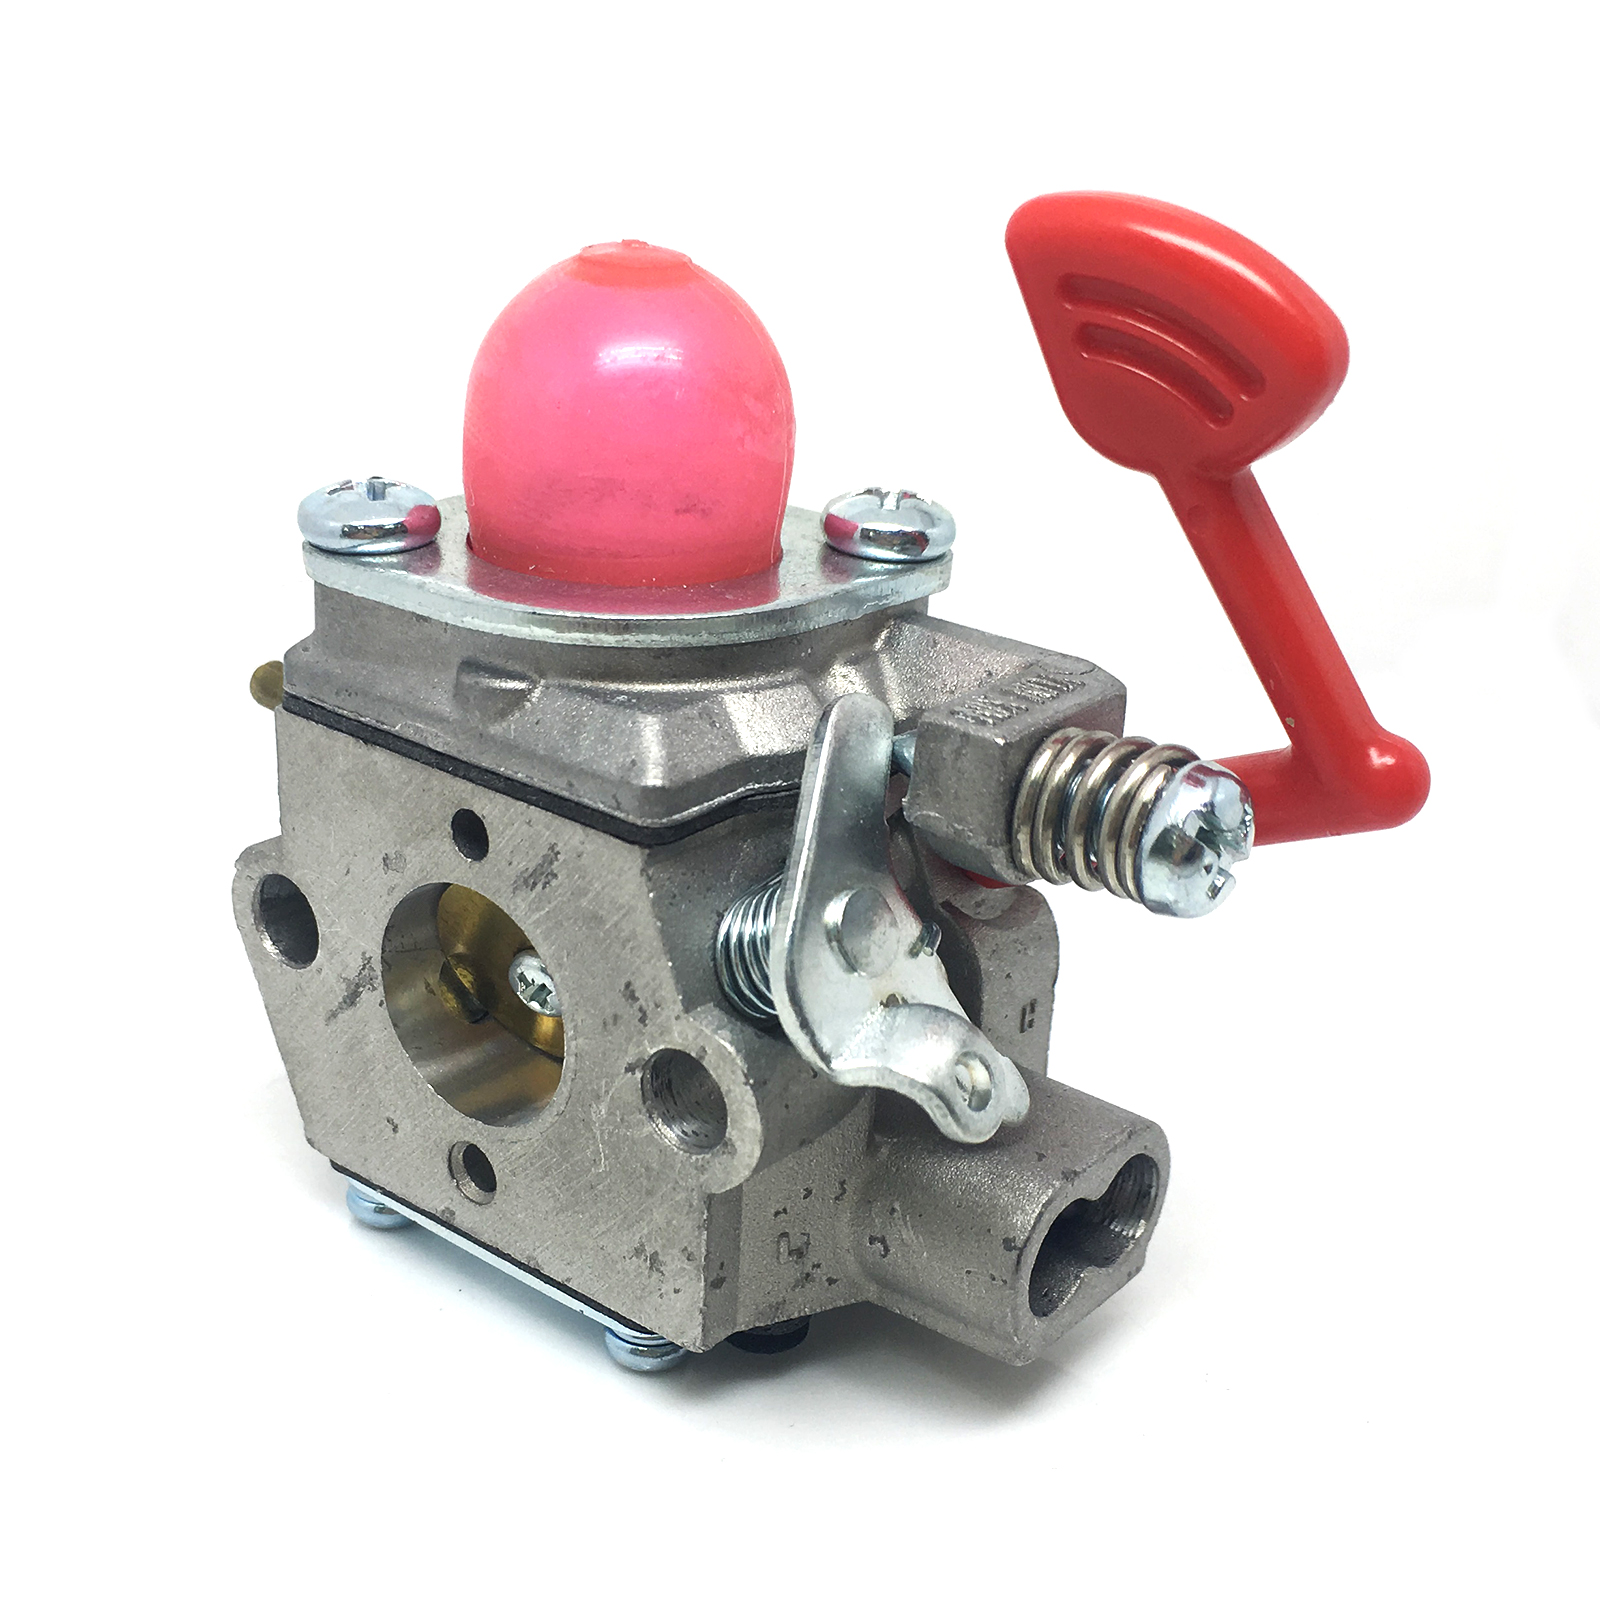 Carburetor For Poulan BVM200VS PPB430VS VS2000BV Pro Craftsman Blower 545081857